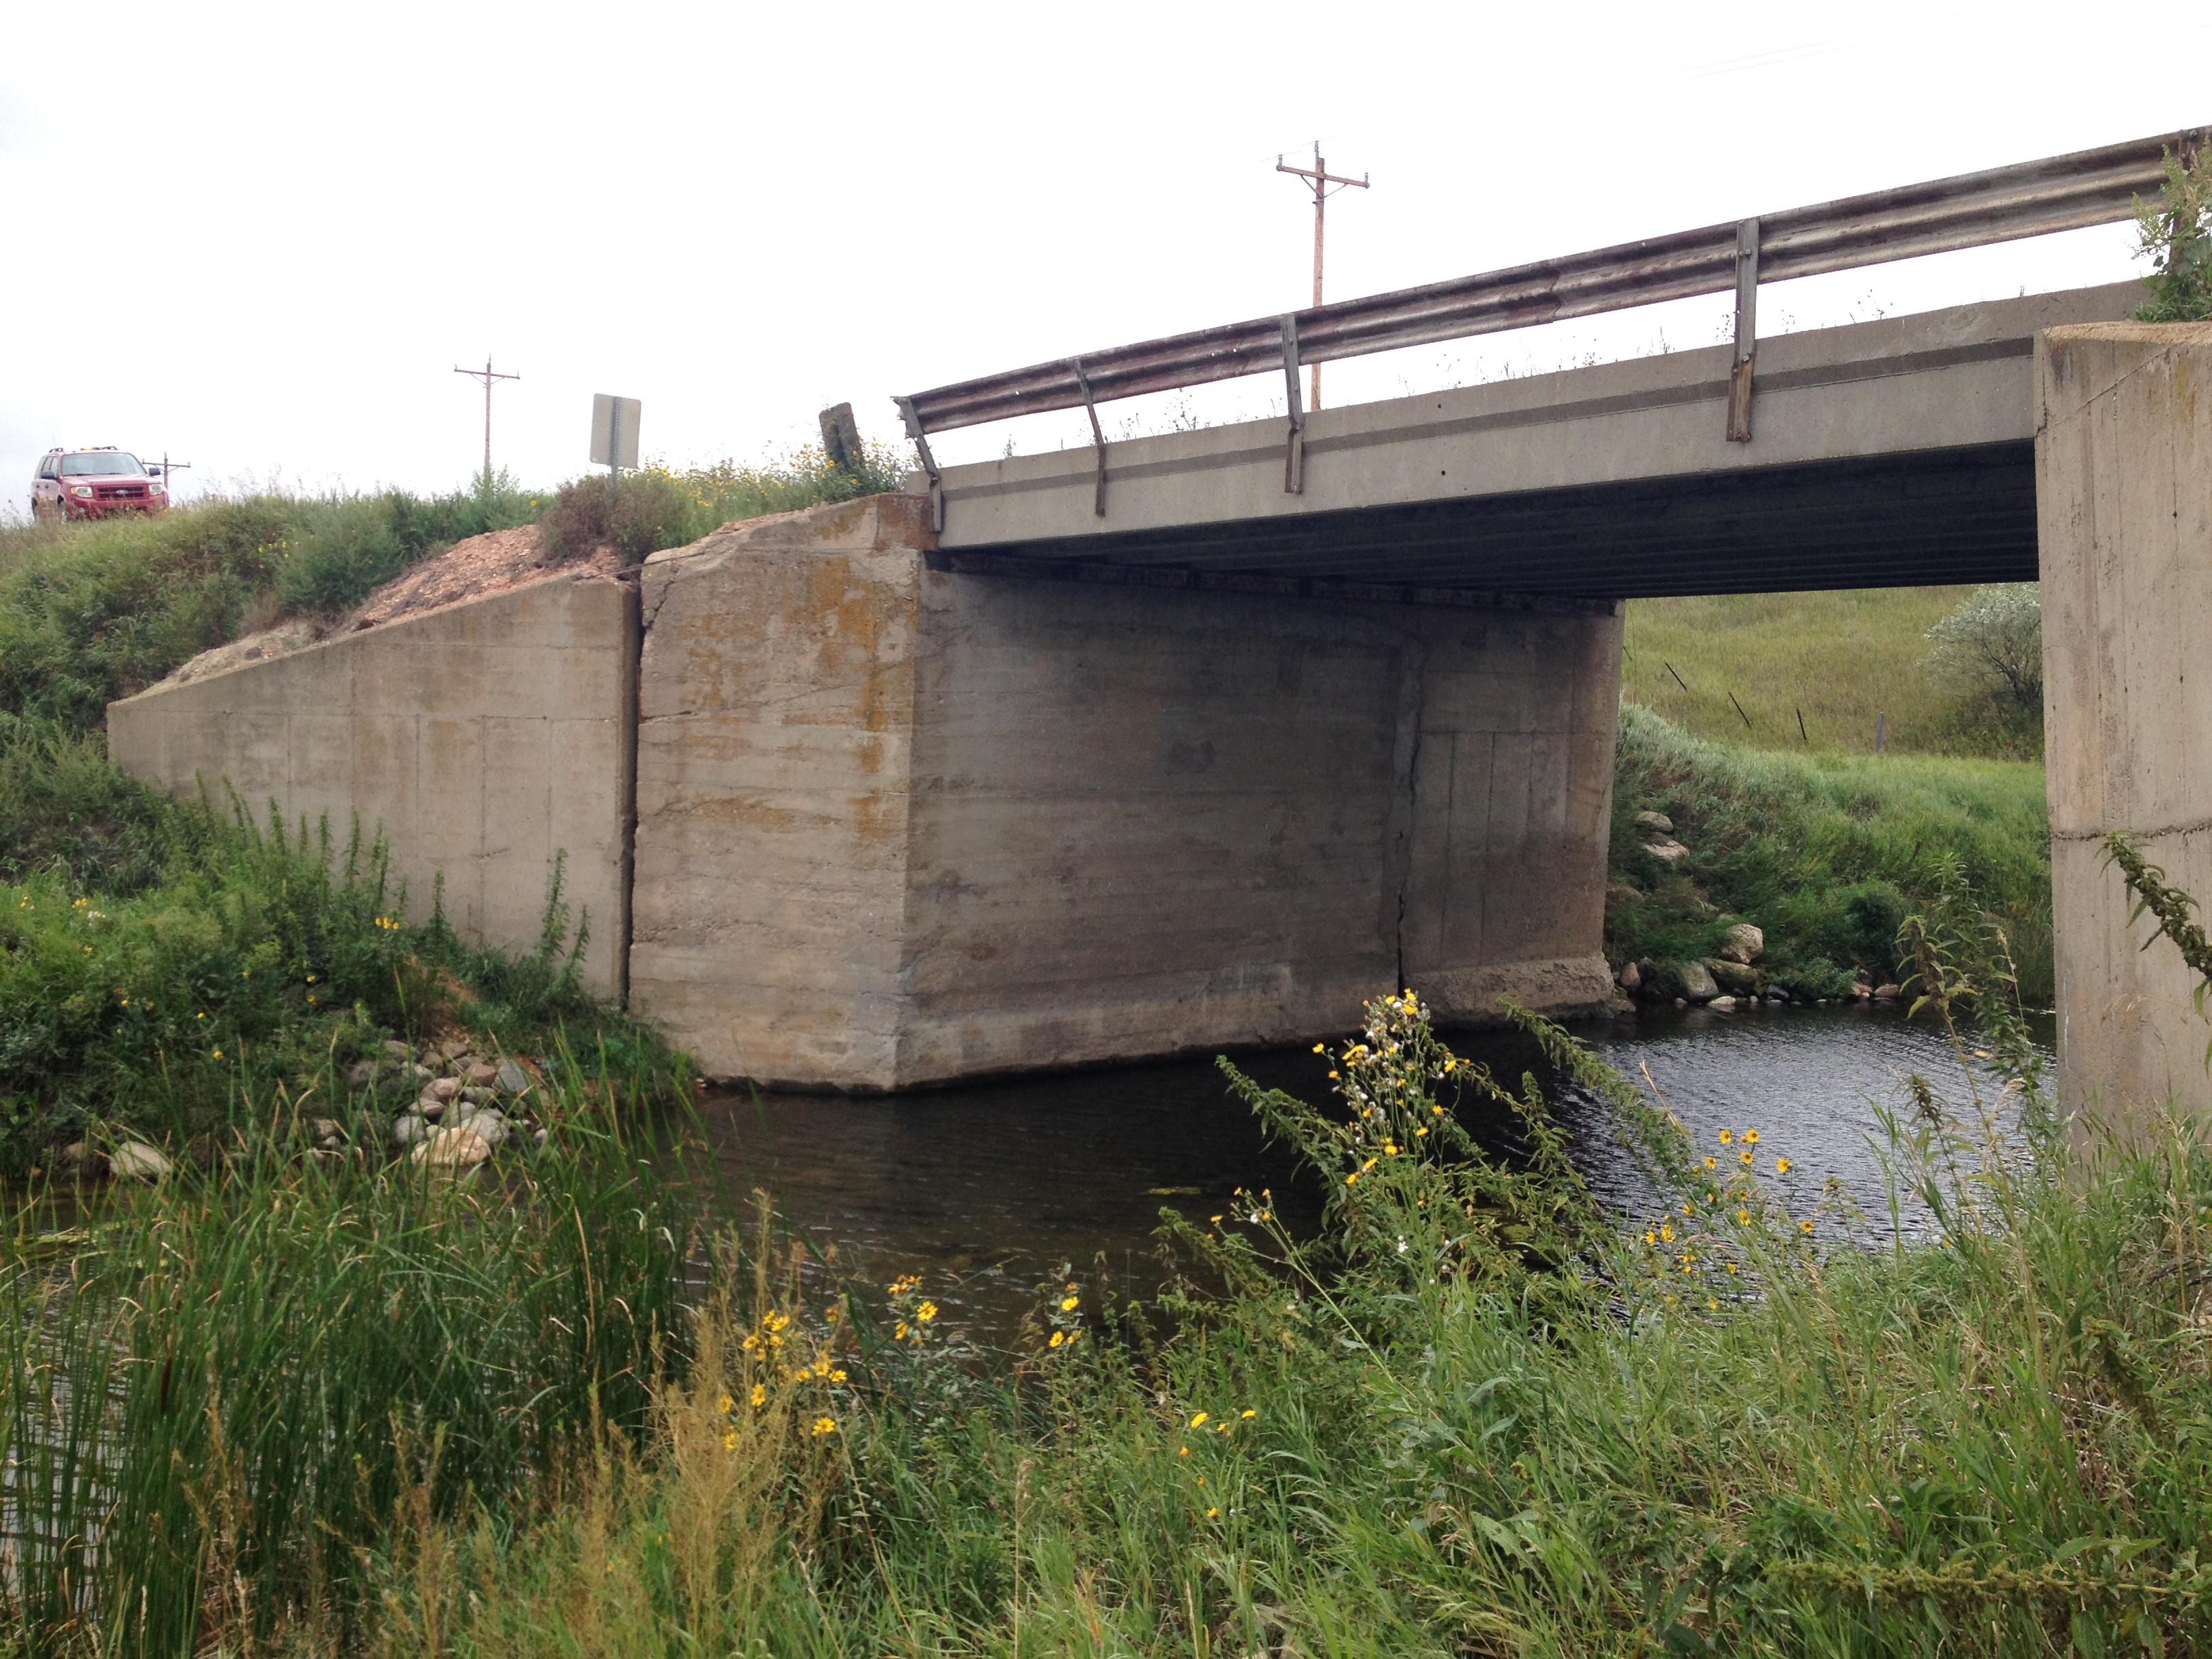 OLD CONCRETE BRIDGE